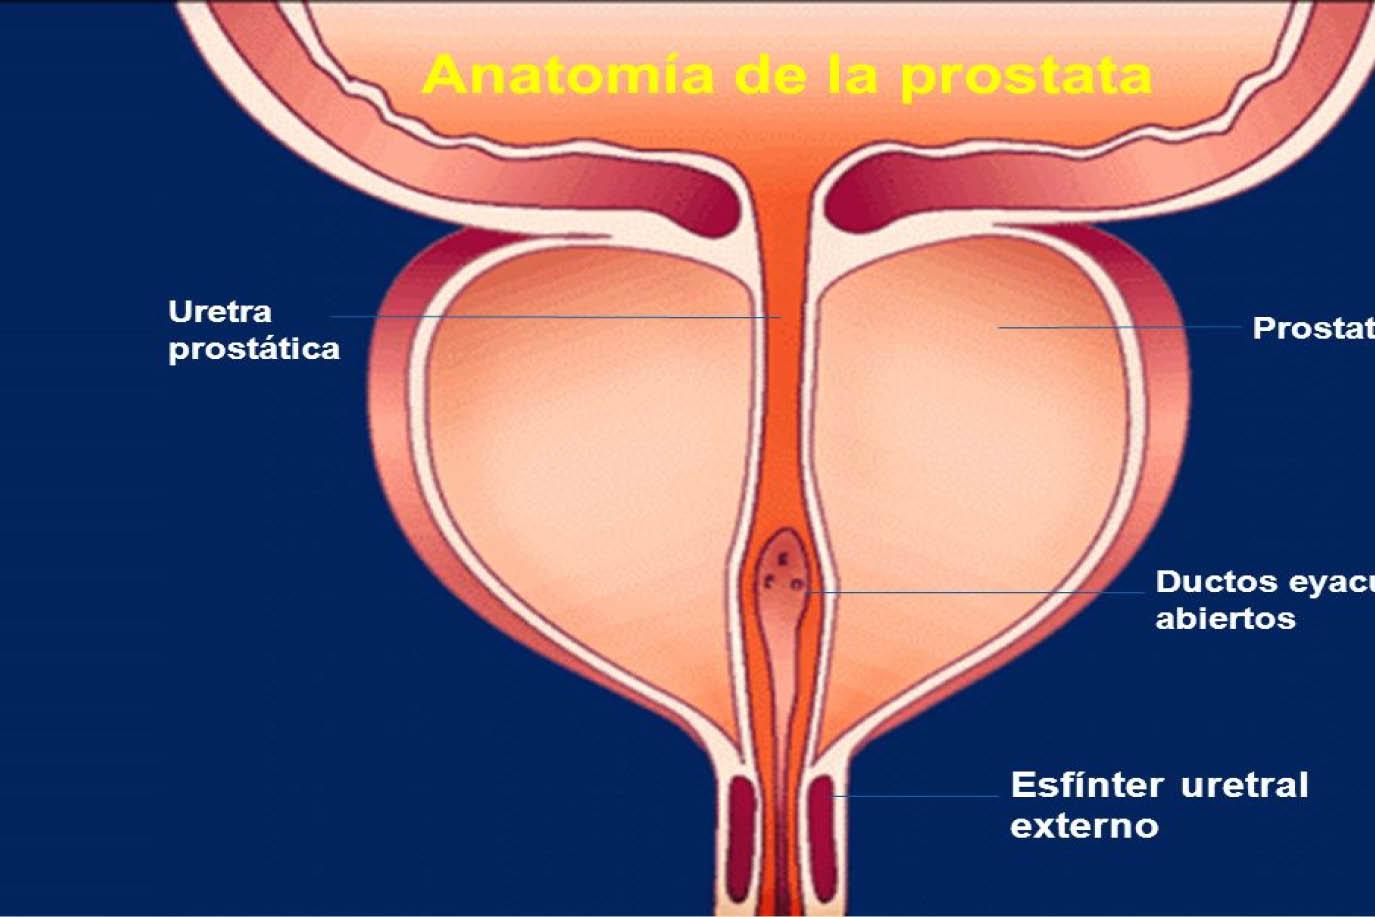 Anatomía de próstata -